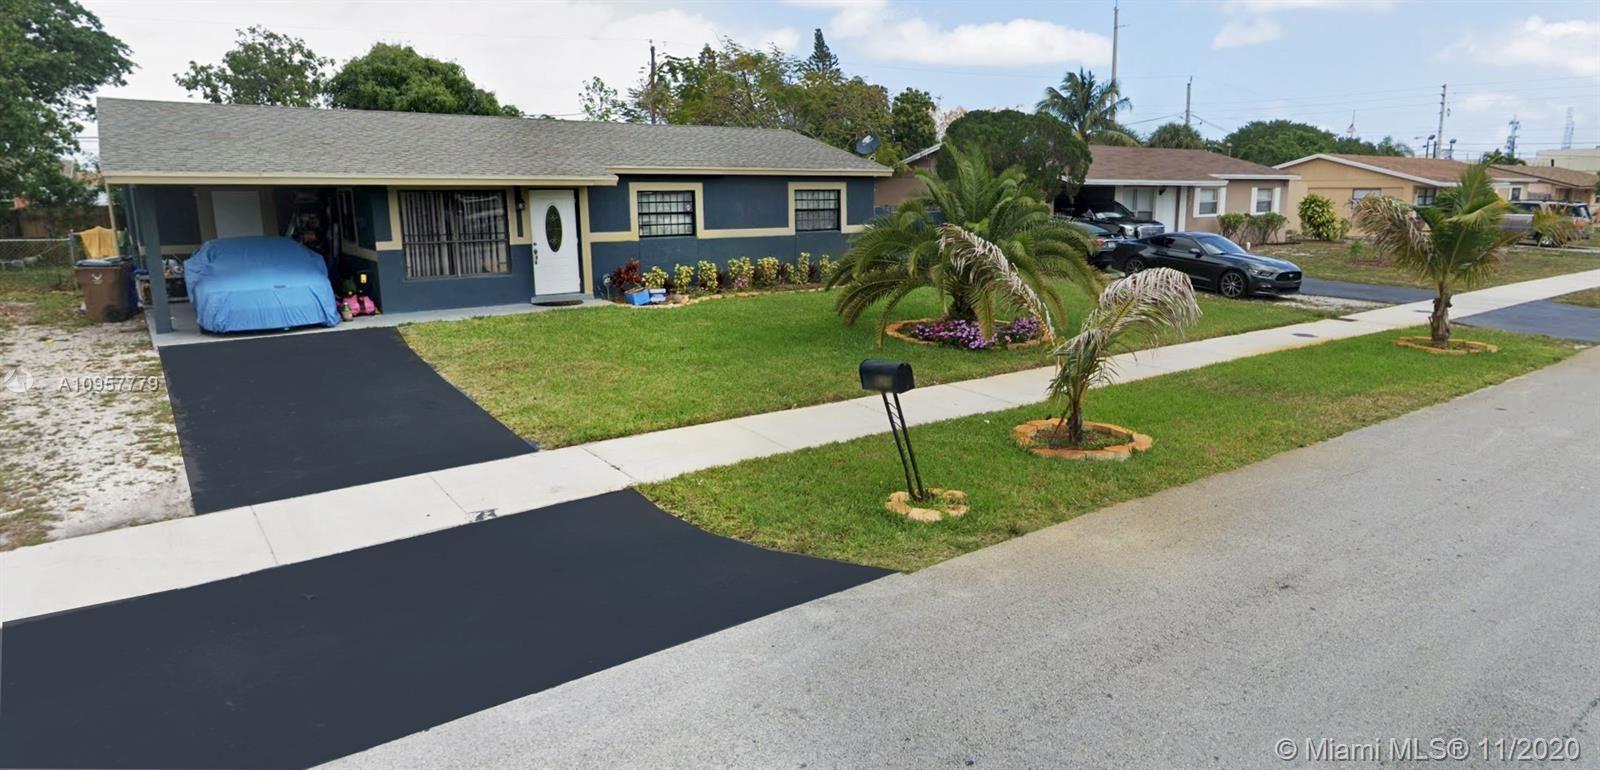 Photo of 821 NE 51st Ct, Deerfield Beach, FL 33064 (MLS # A10957779)